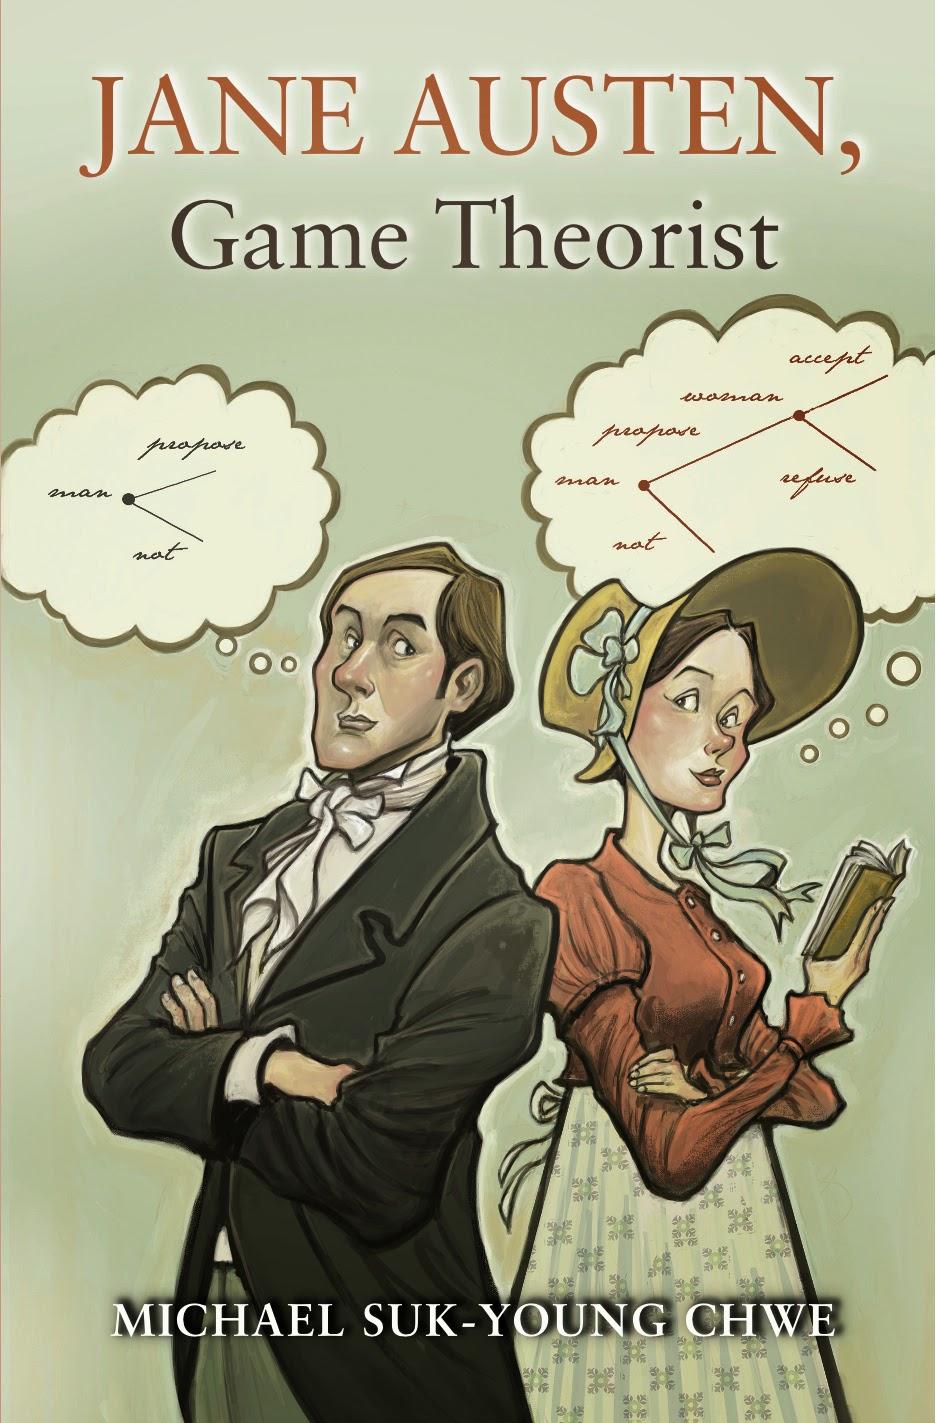 Jane Austen, Game Theorist - Michael Chwe